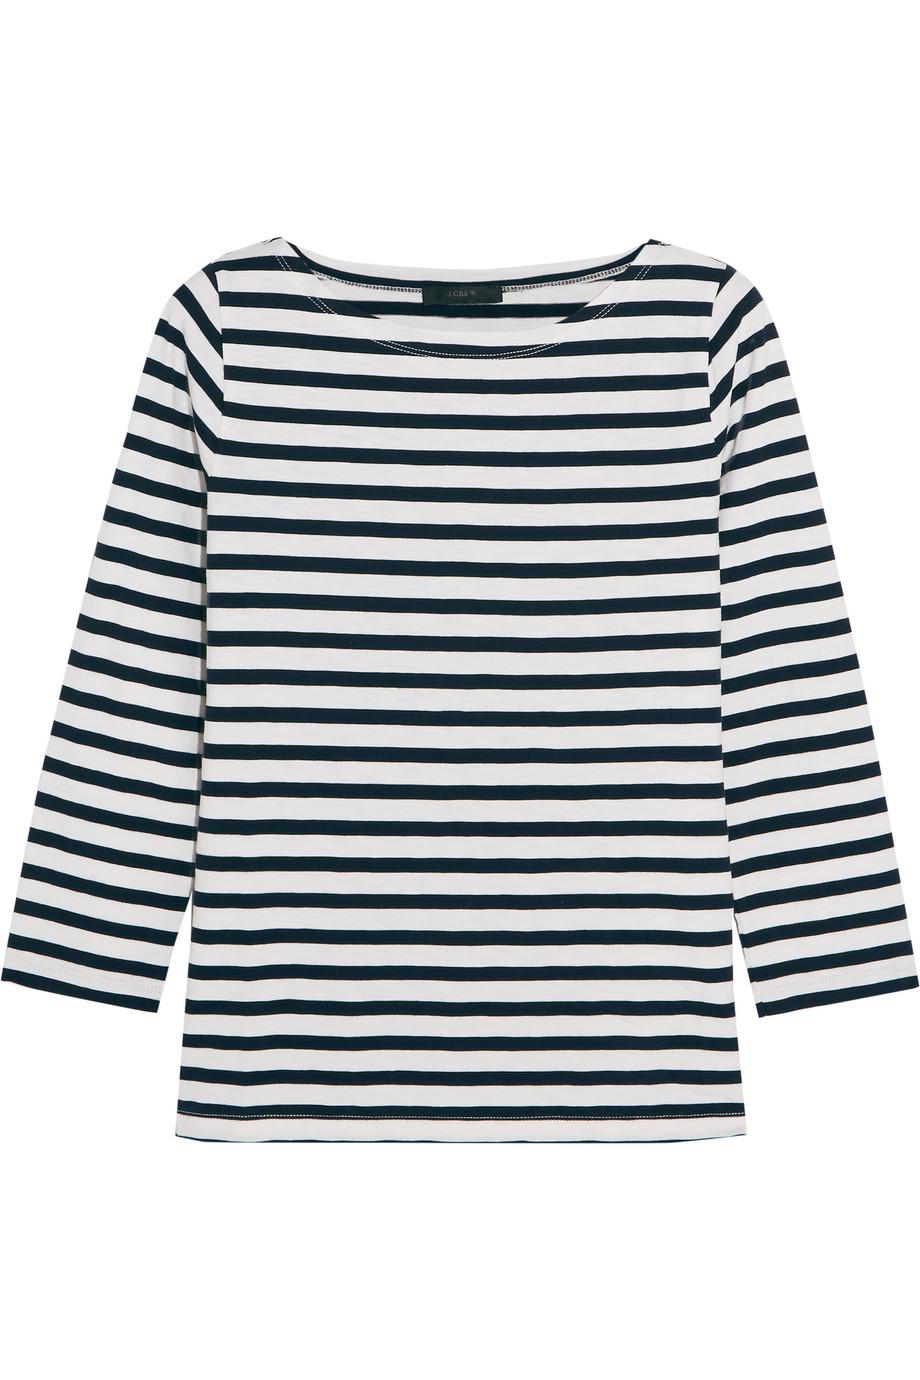 J.Crew Striped Cotton-Jersey Top, Navy, Women's, Size: XL